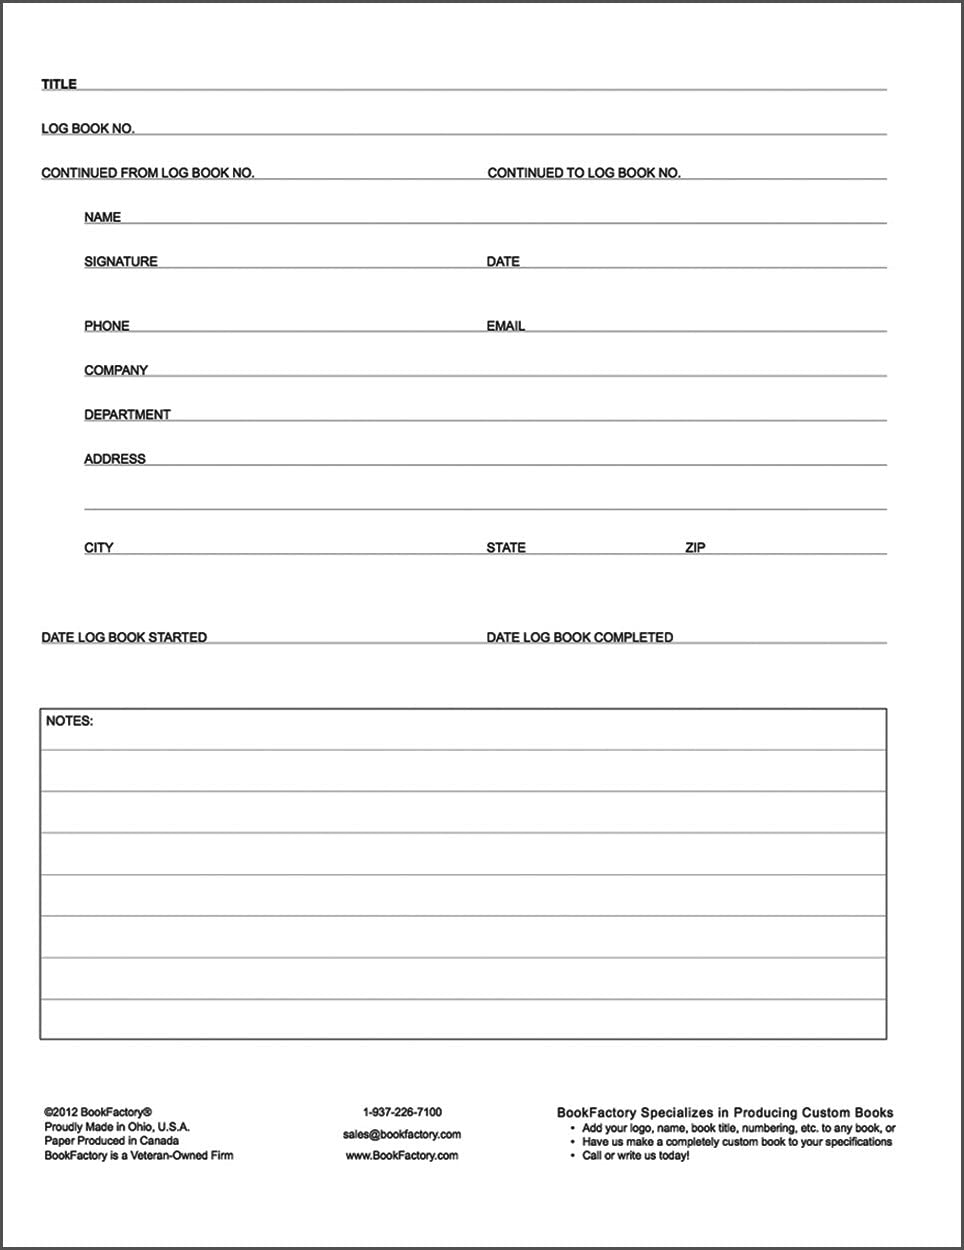 BookFactory/® Mitigation Log Book // Journal // Logbook Black Hardbound 8.5x11 Mitigation Log Book XLog-120-7CS-A-L-Black 120 Page